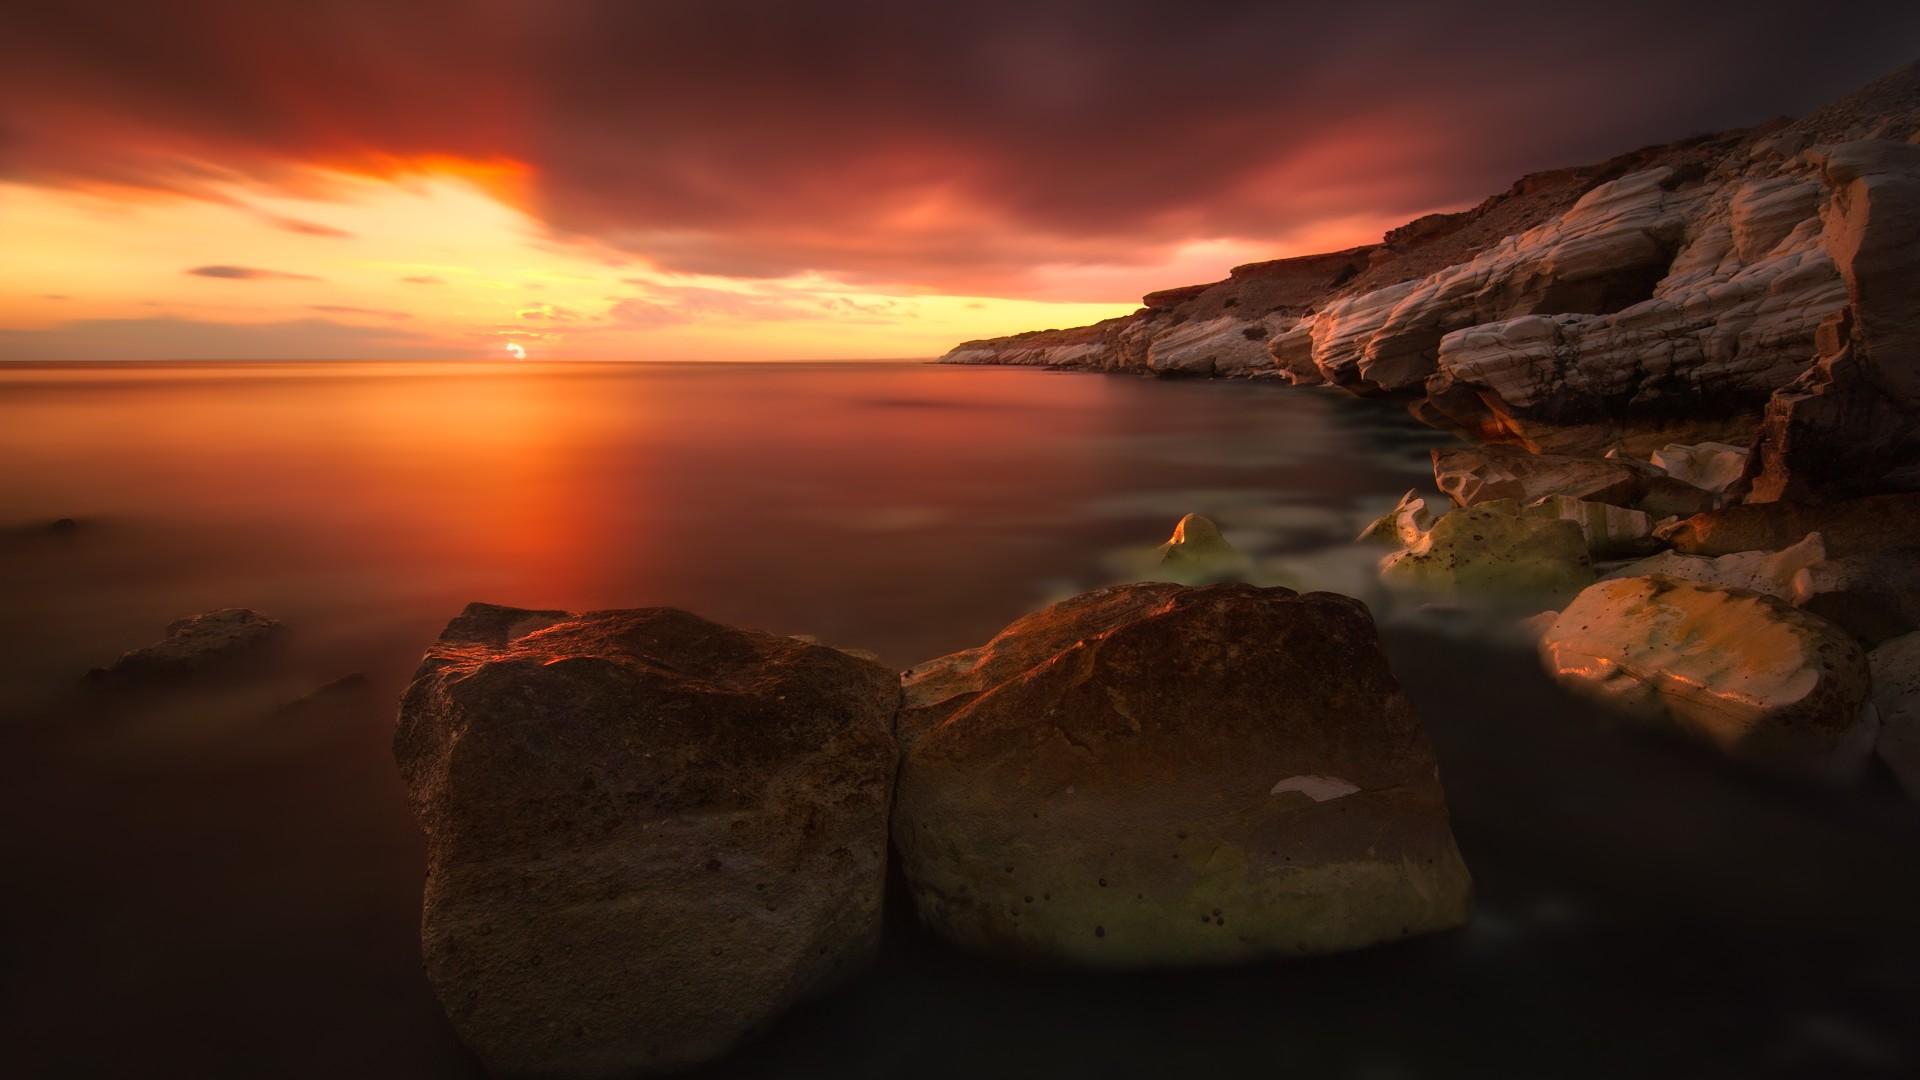 Lg V20 3d Wallpaper Rocky Coastline Sunset Wallpapers Hd Wallpapers Id 17354